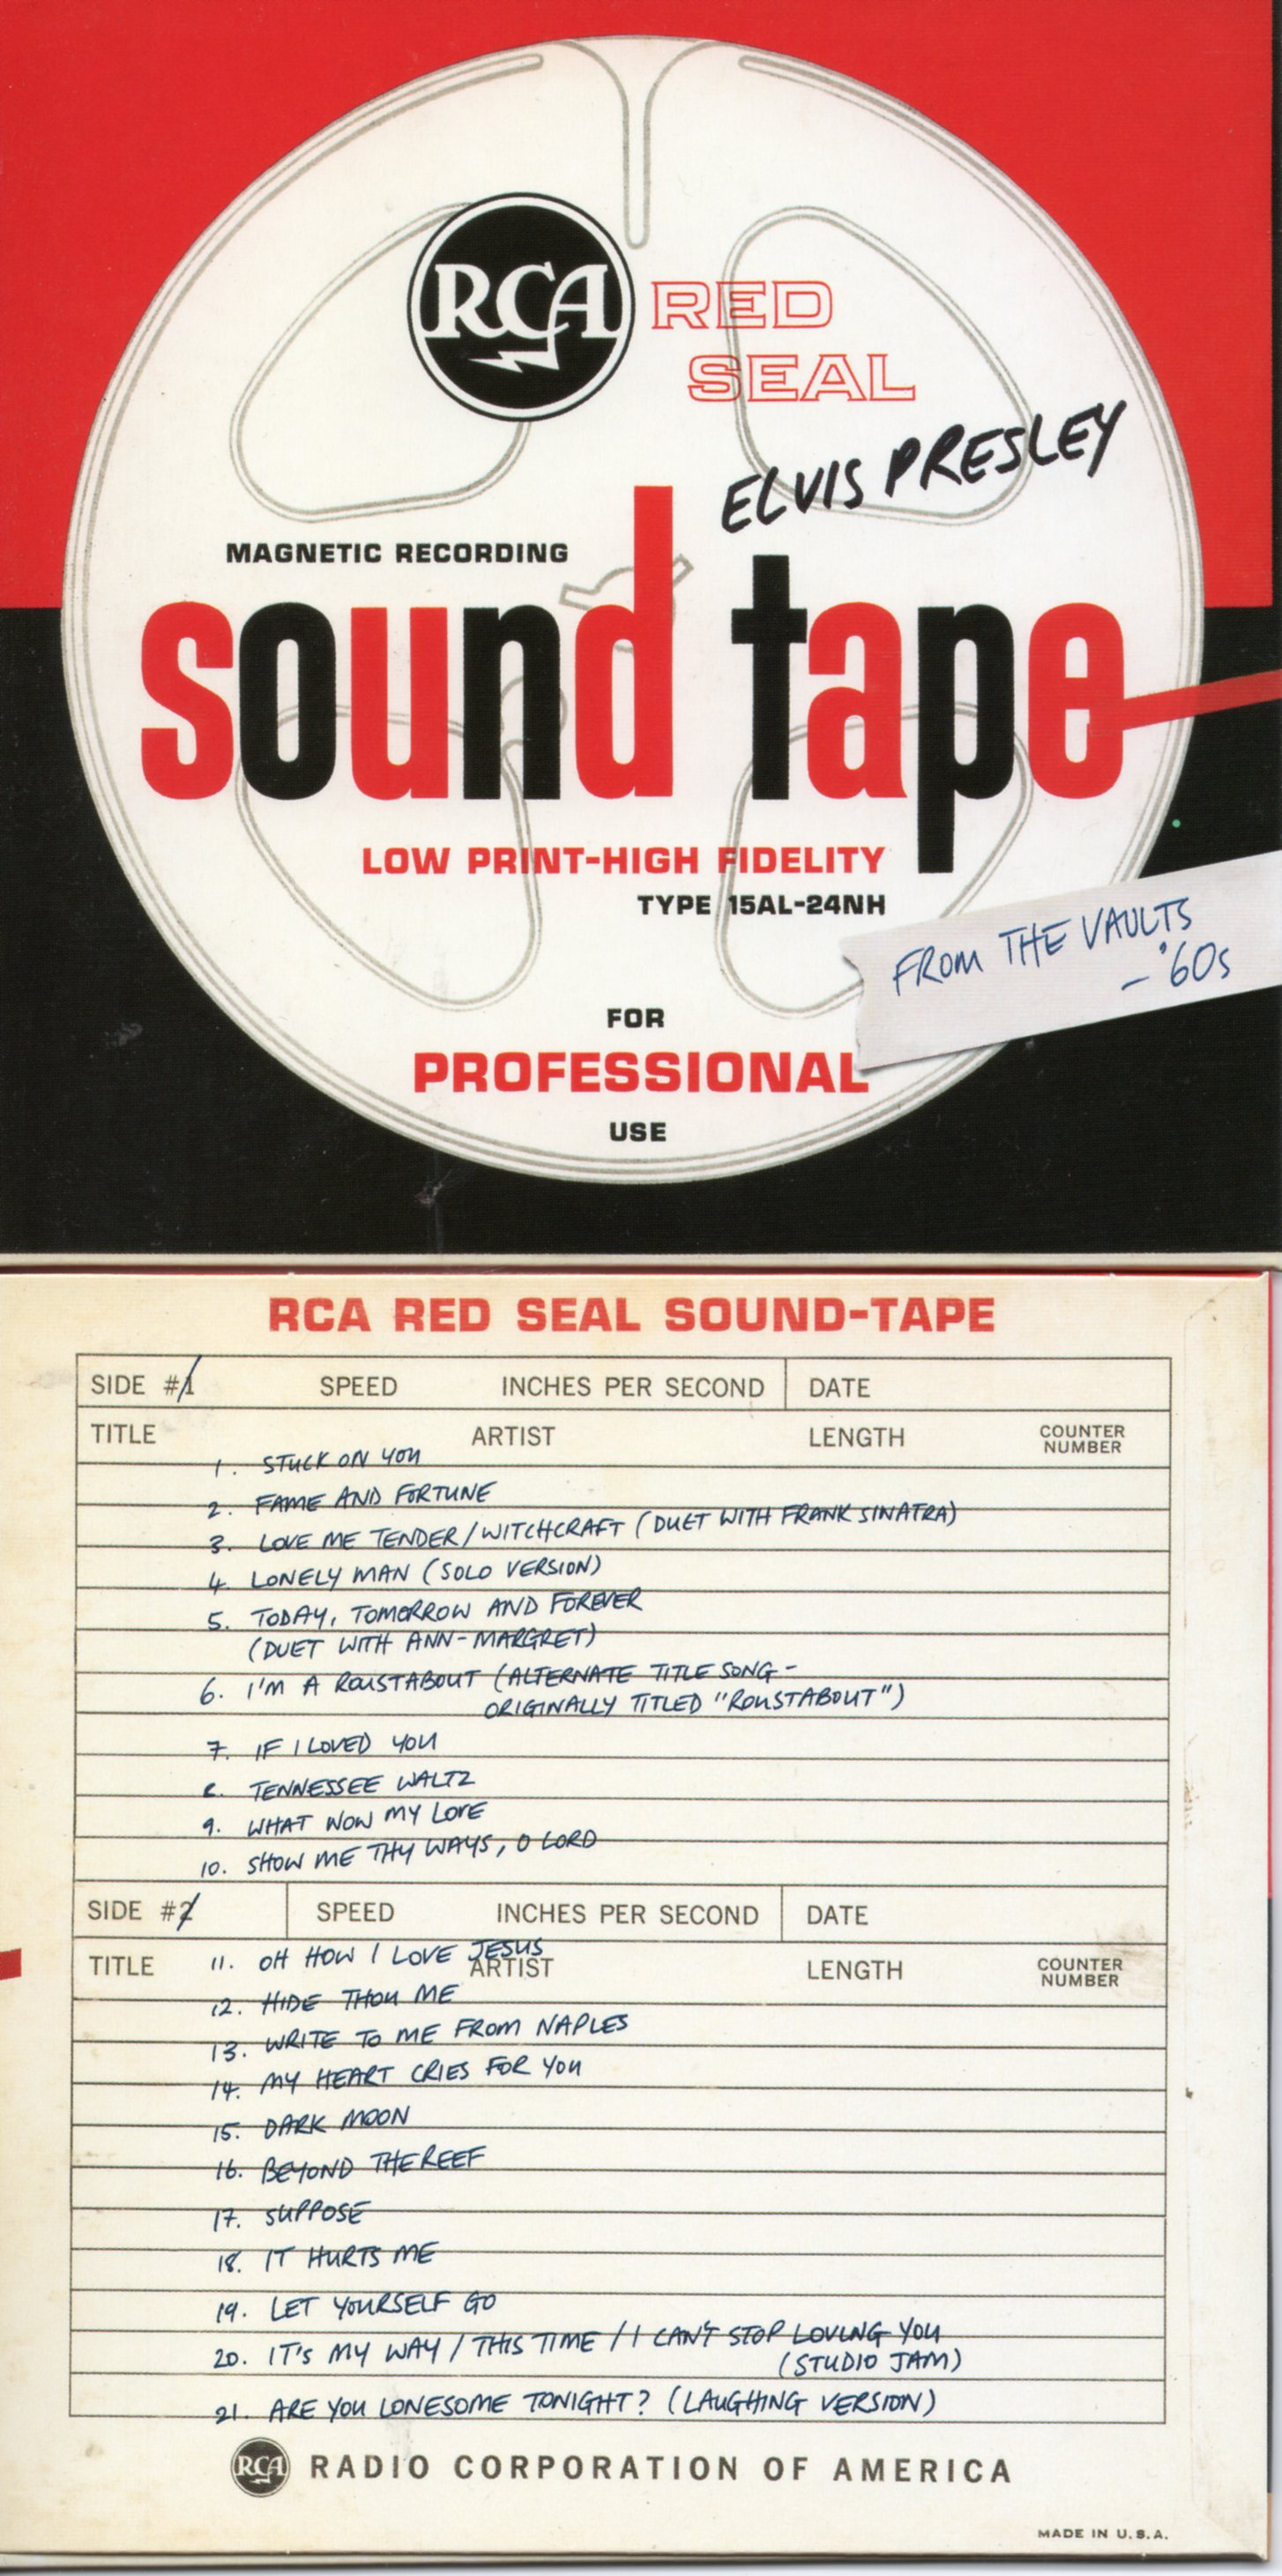 Elvis PRESLEY - From The Vaults '60s - Cardboard Sleeve - 21-track Rare Tracks